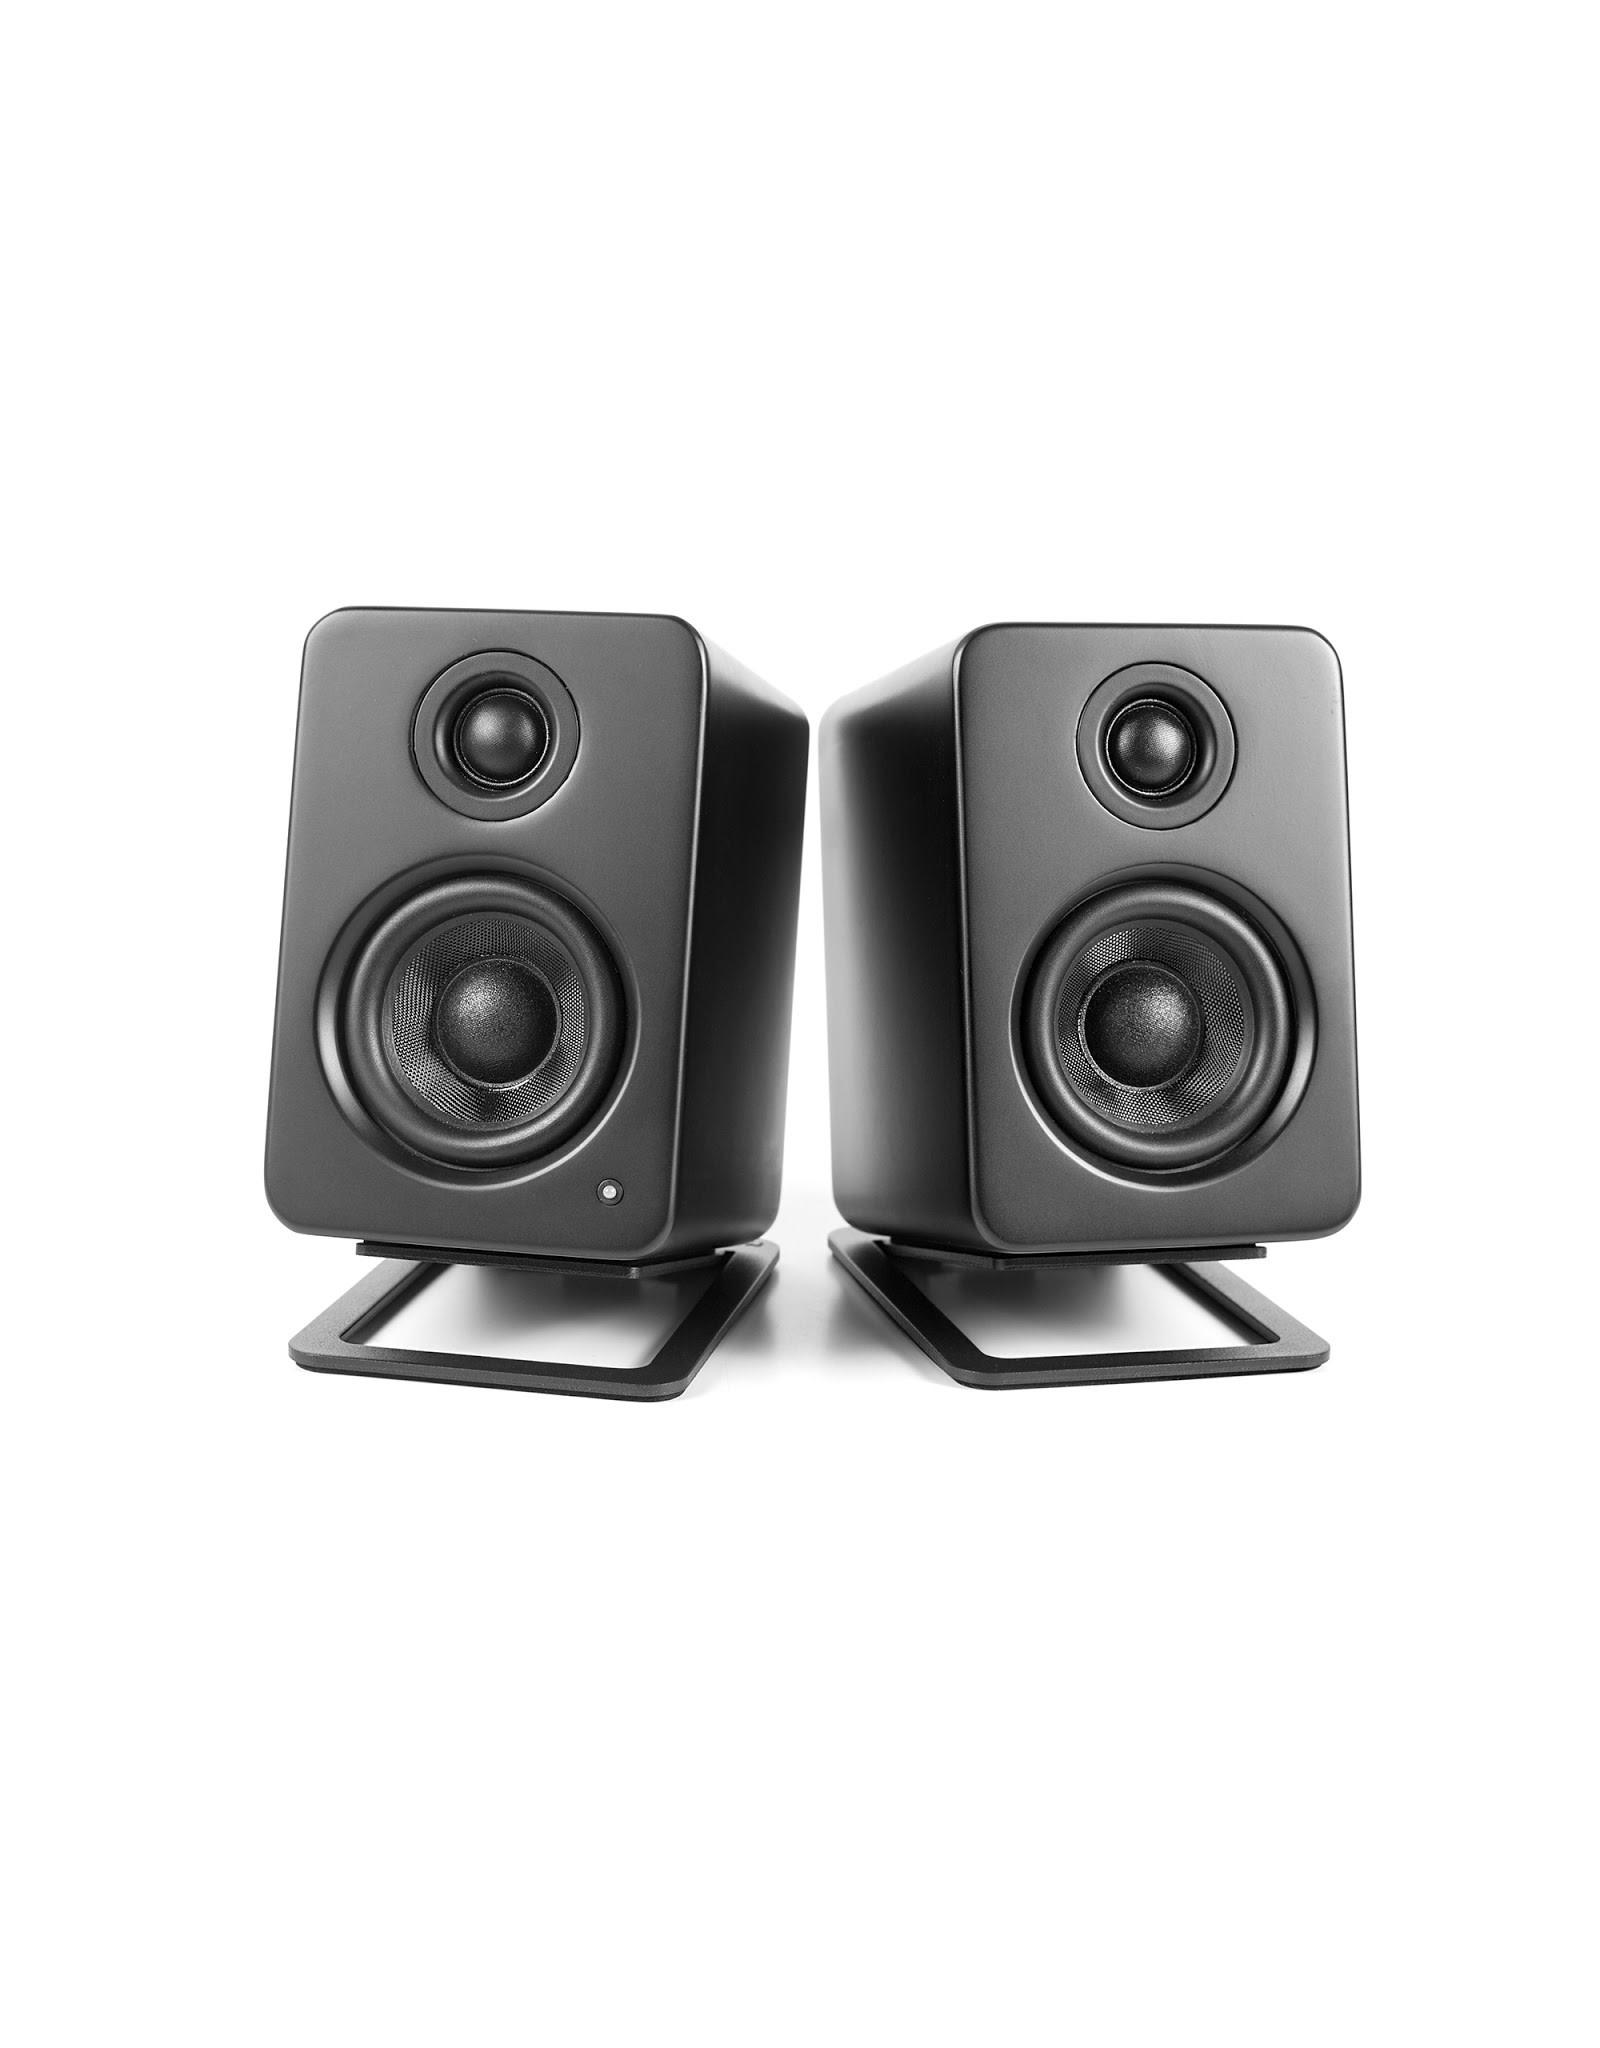 Kanto Kanto S2 Desktop Speaker Stands